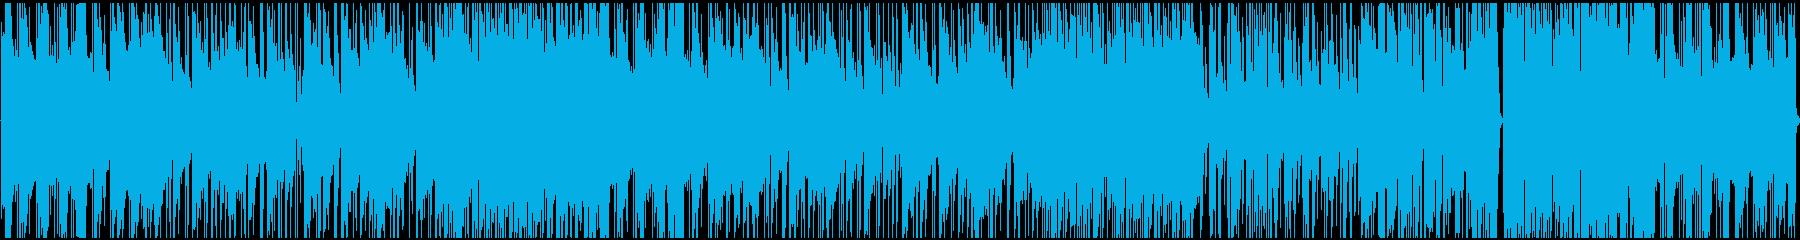 JAZZテイストぼHIPHOPの再生済みの波形